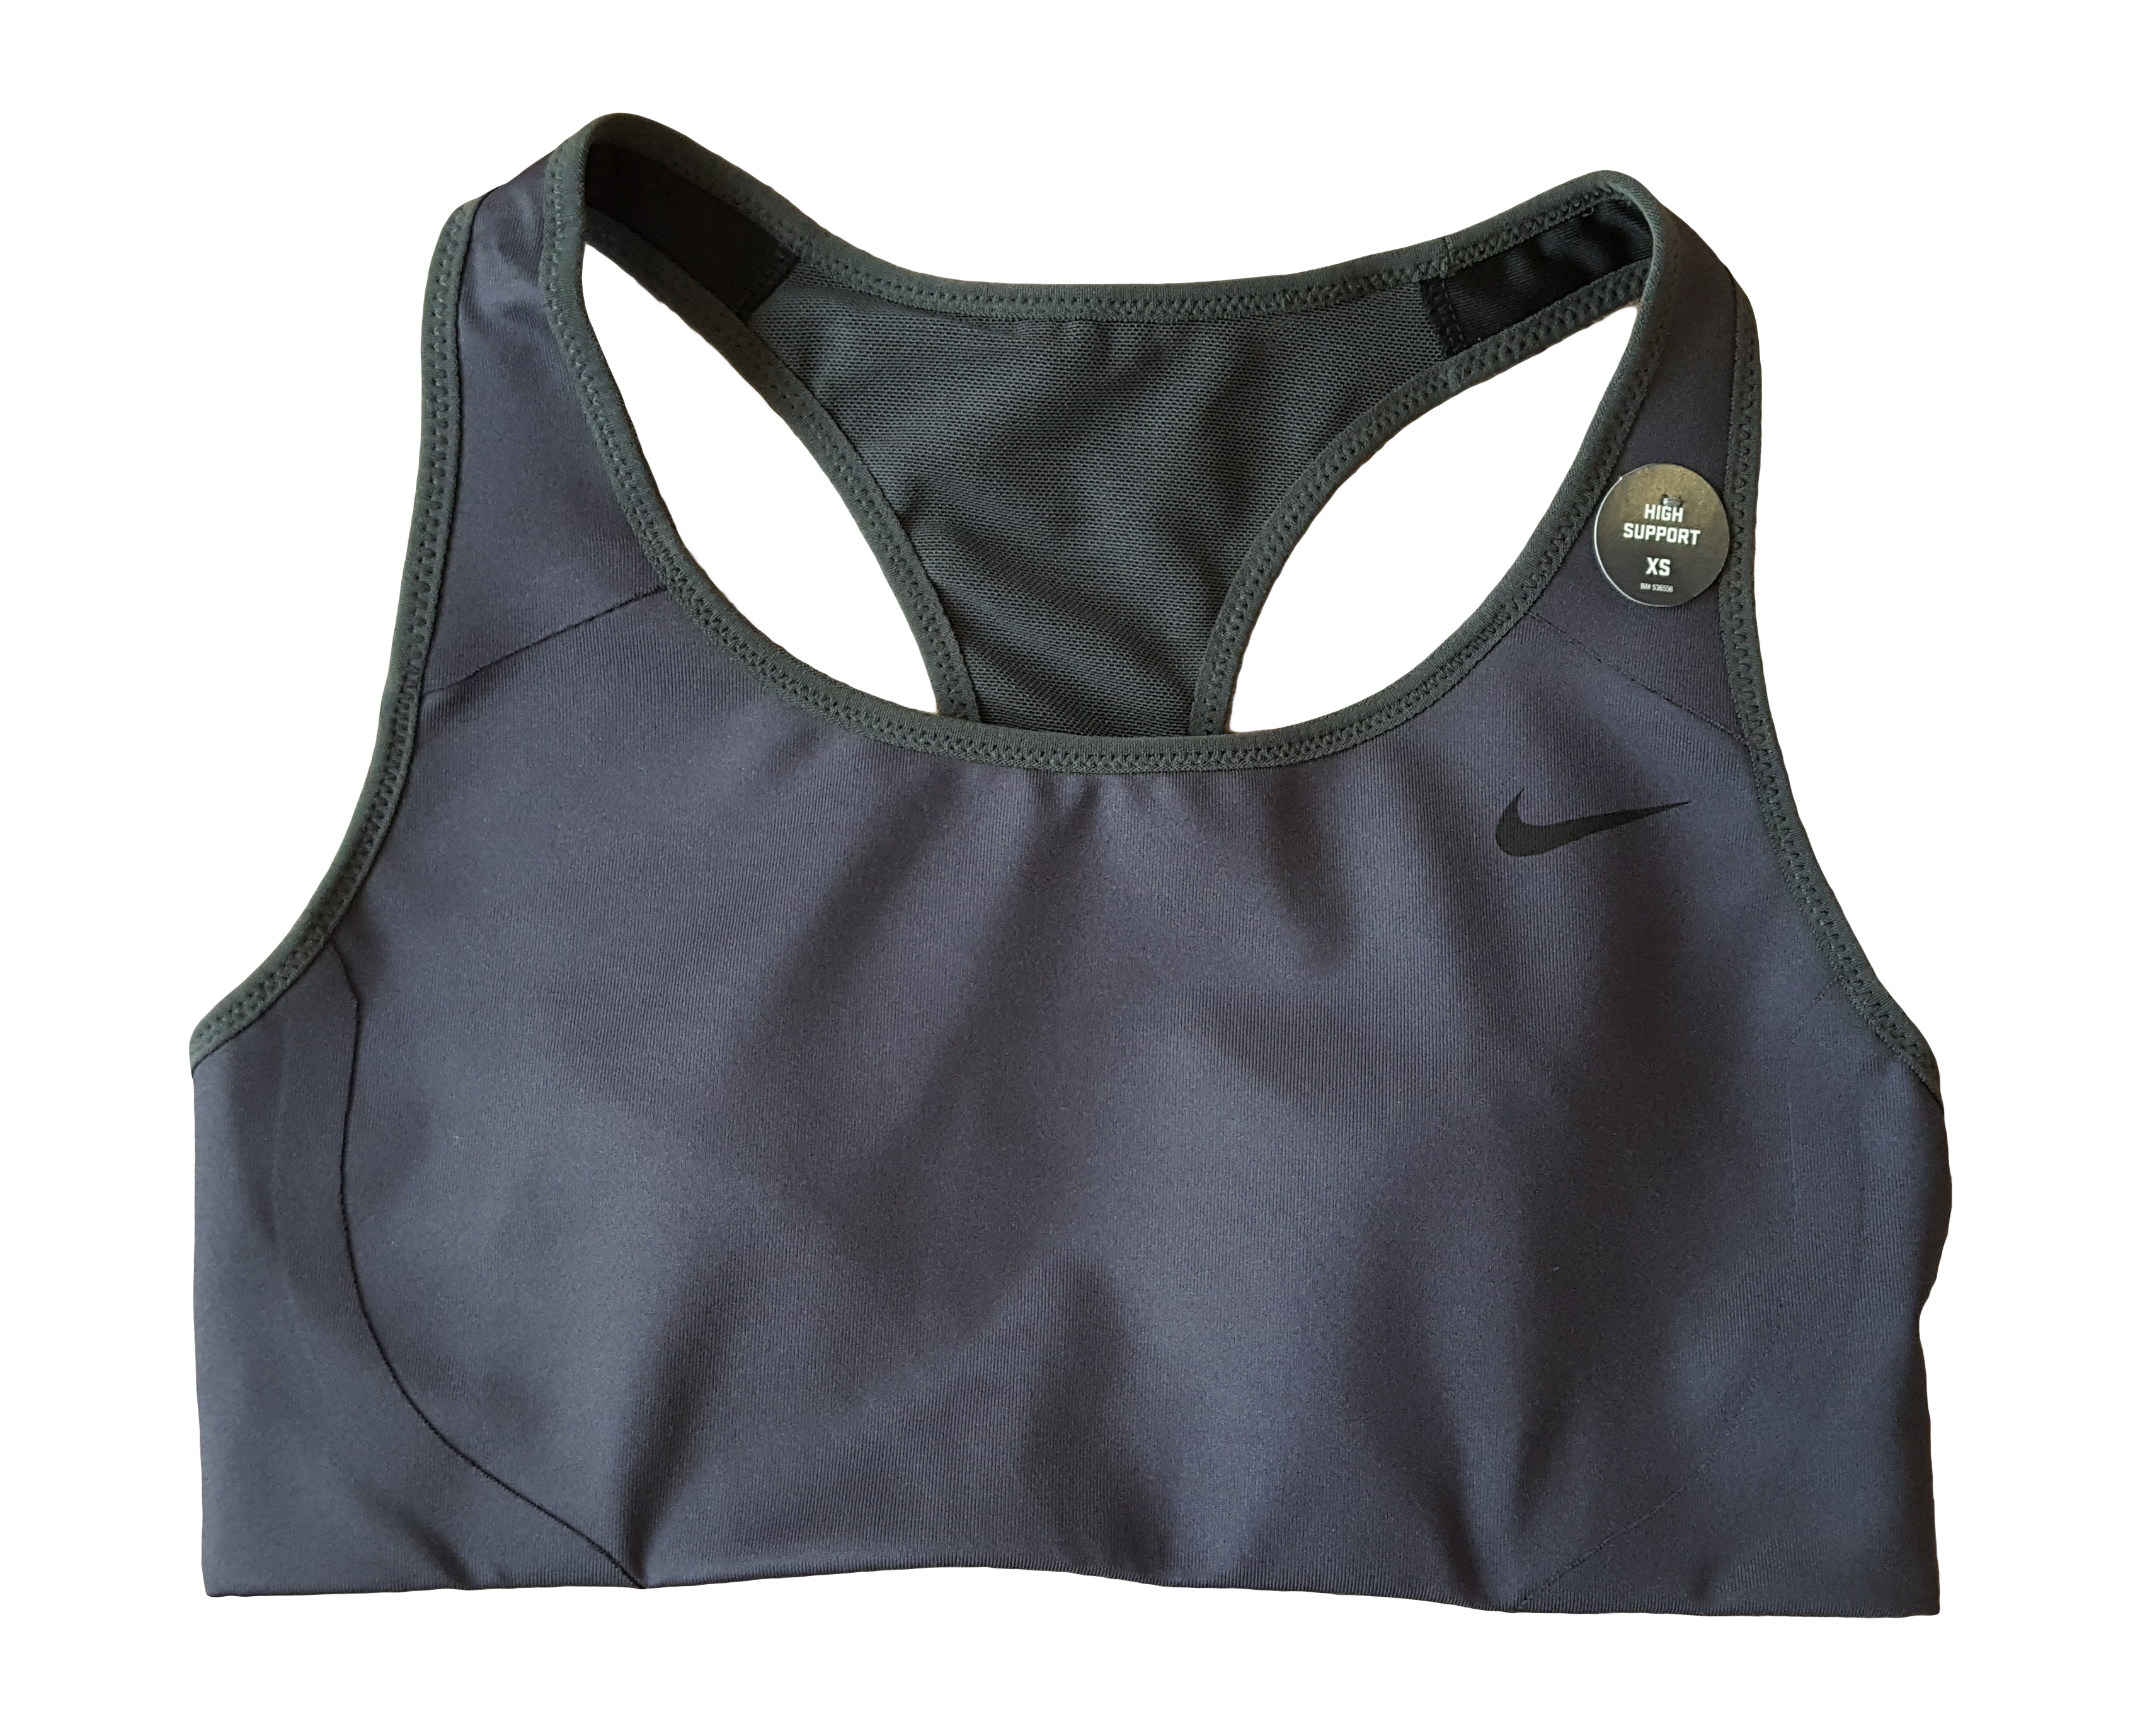 818fe3904b5e98 Home   Brands   Nike   Nike Women s Dri-FIT Running High Lift Support Sports  Bra Size XS